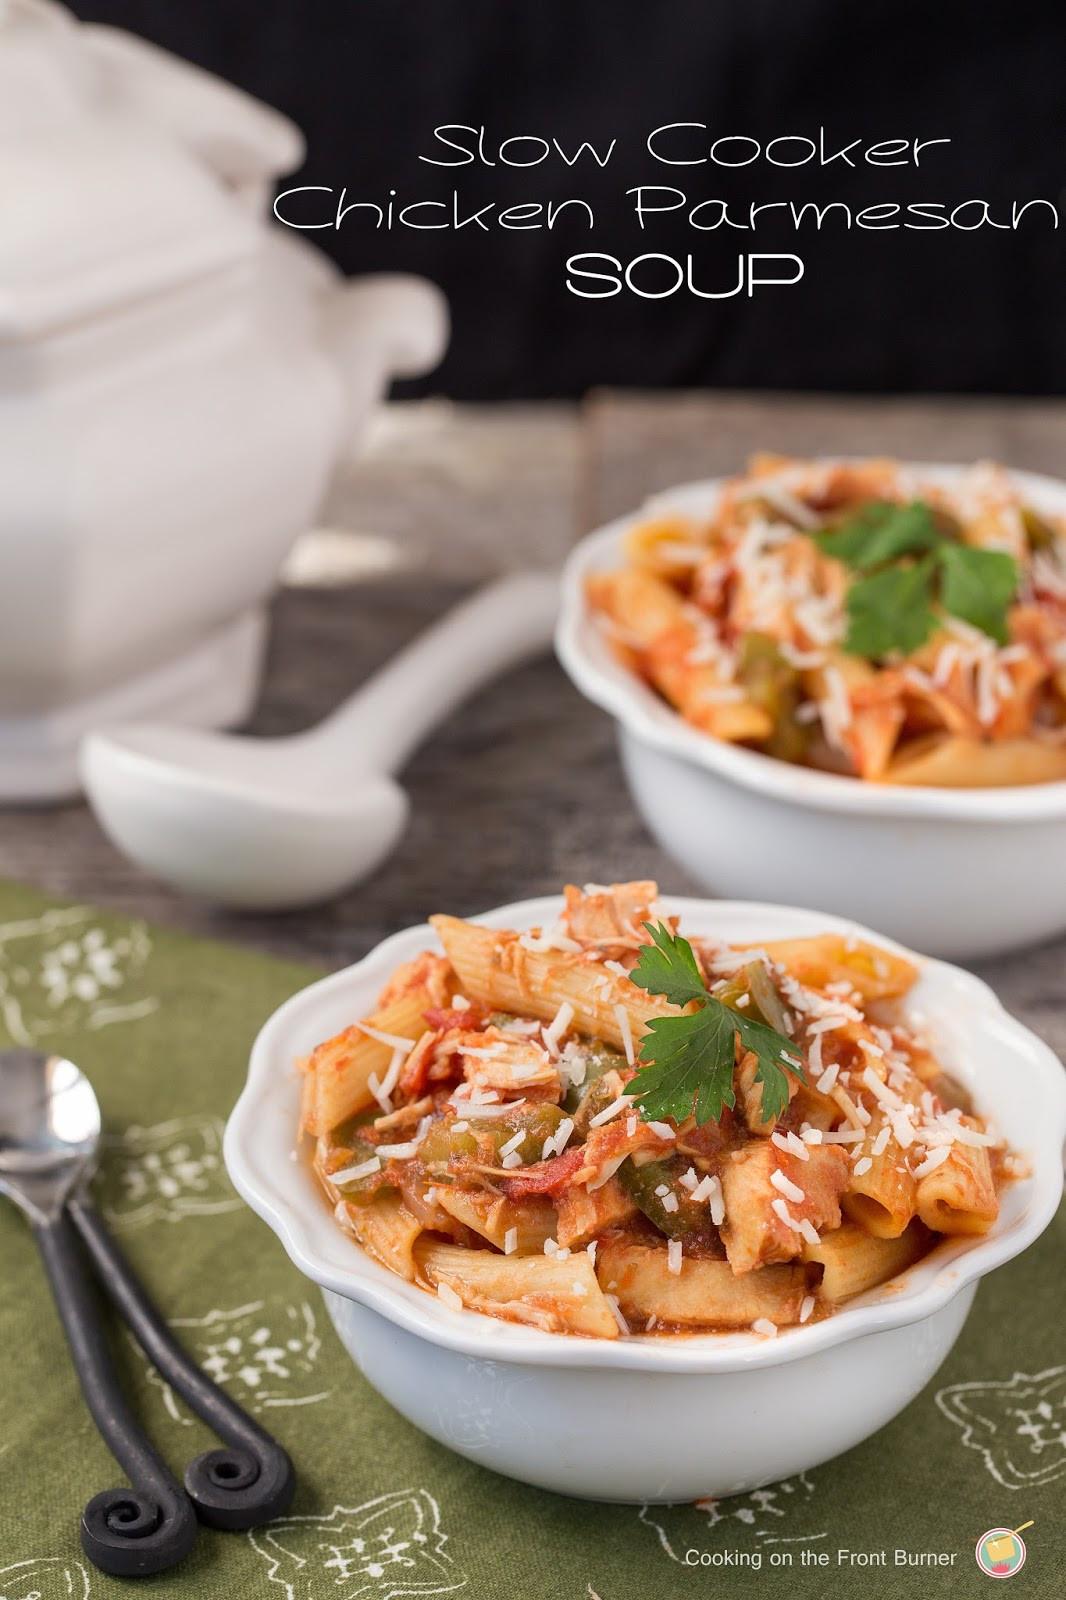 Chicken Parmesan Soup  SLOW COOKER CHICKEN PARMESAN SOUP